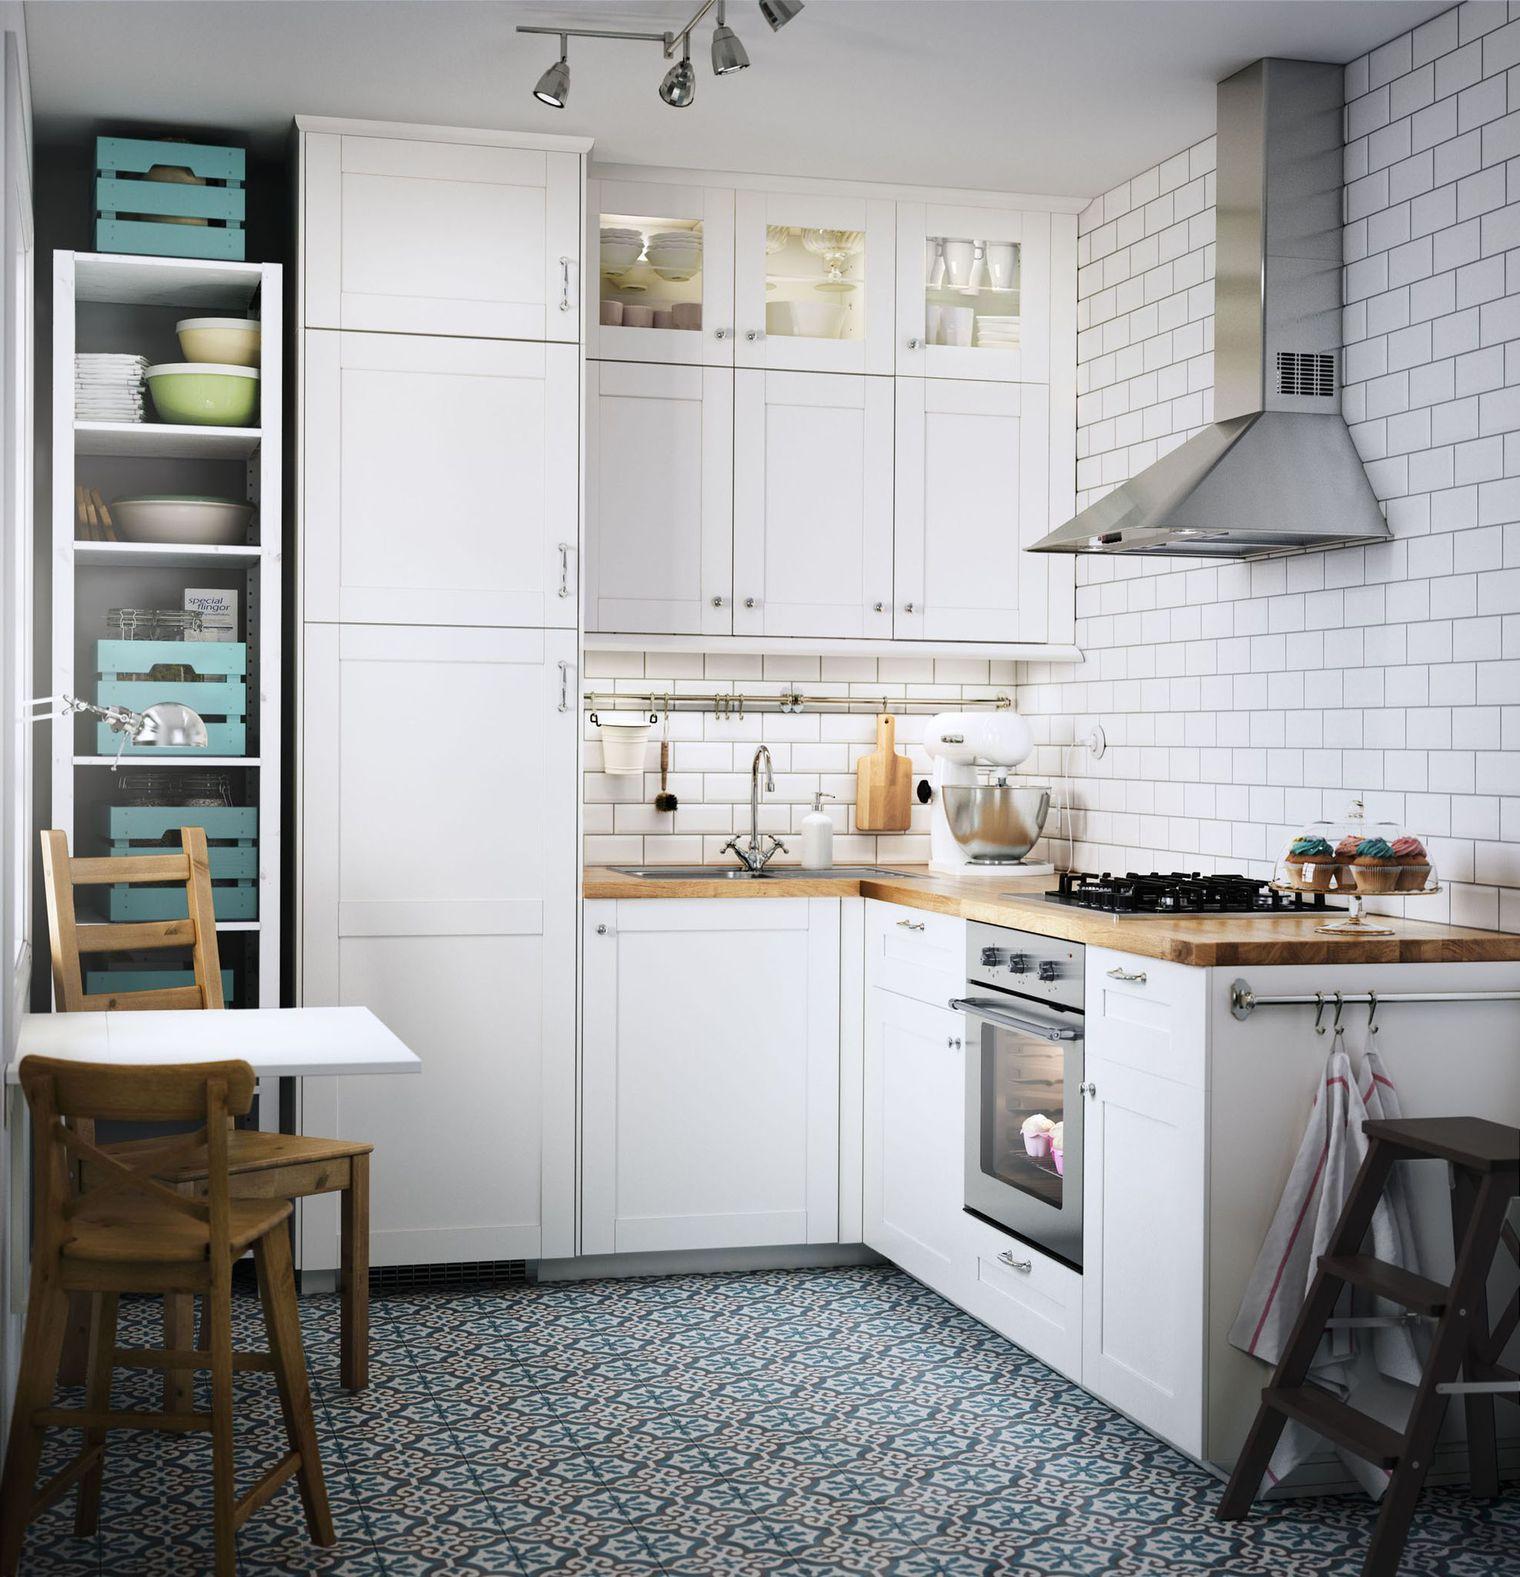 Small kitchen-4